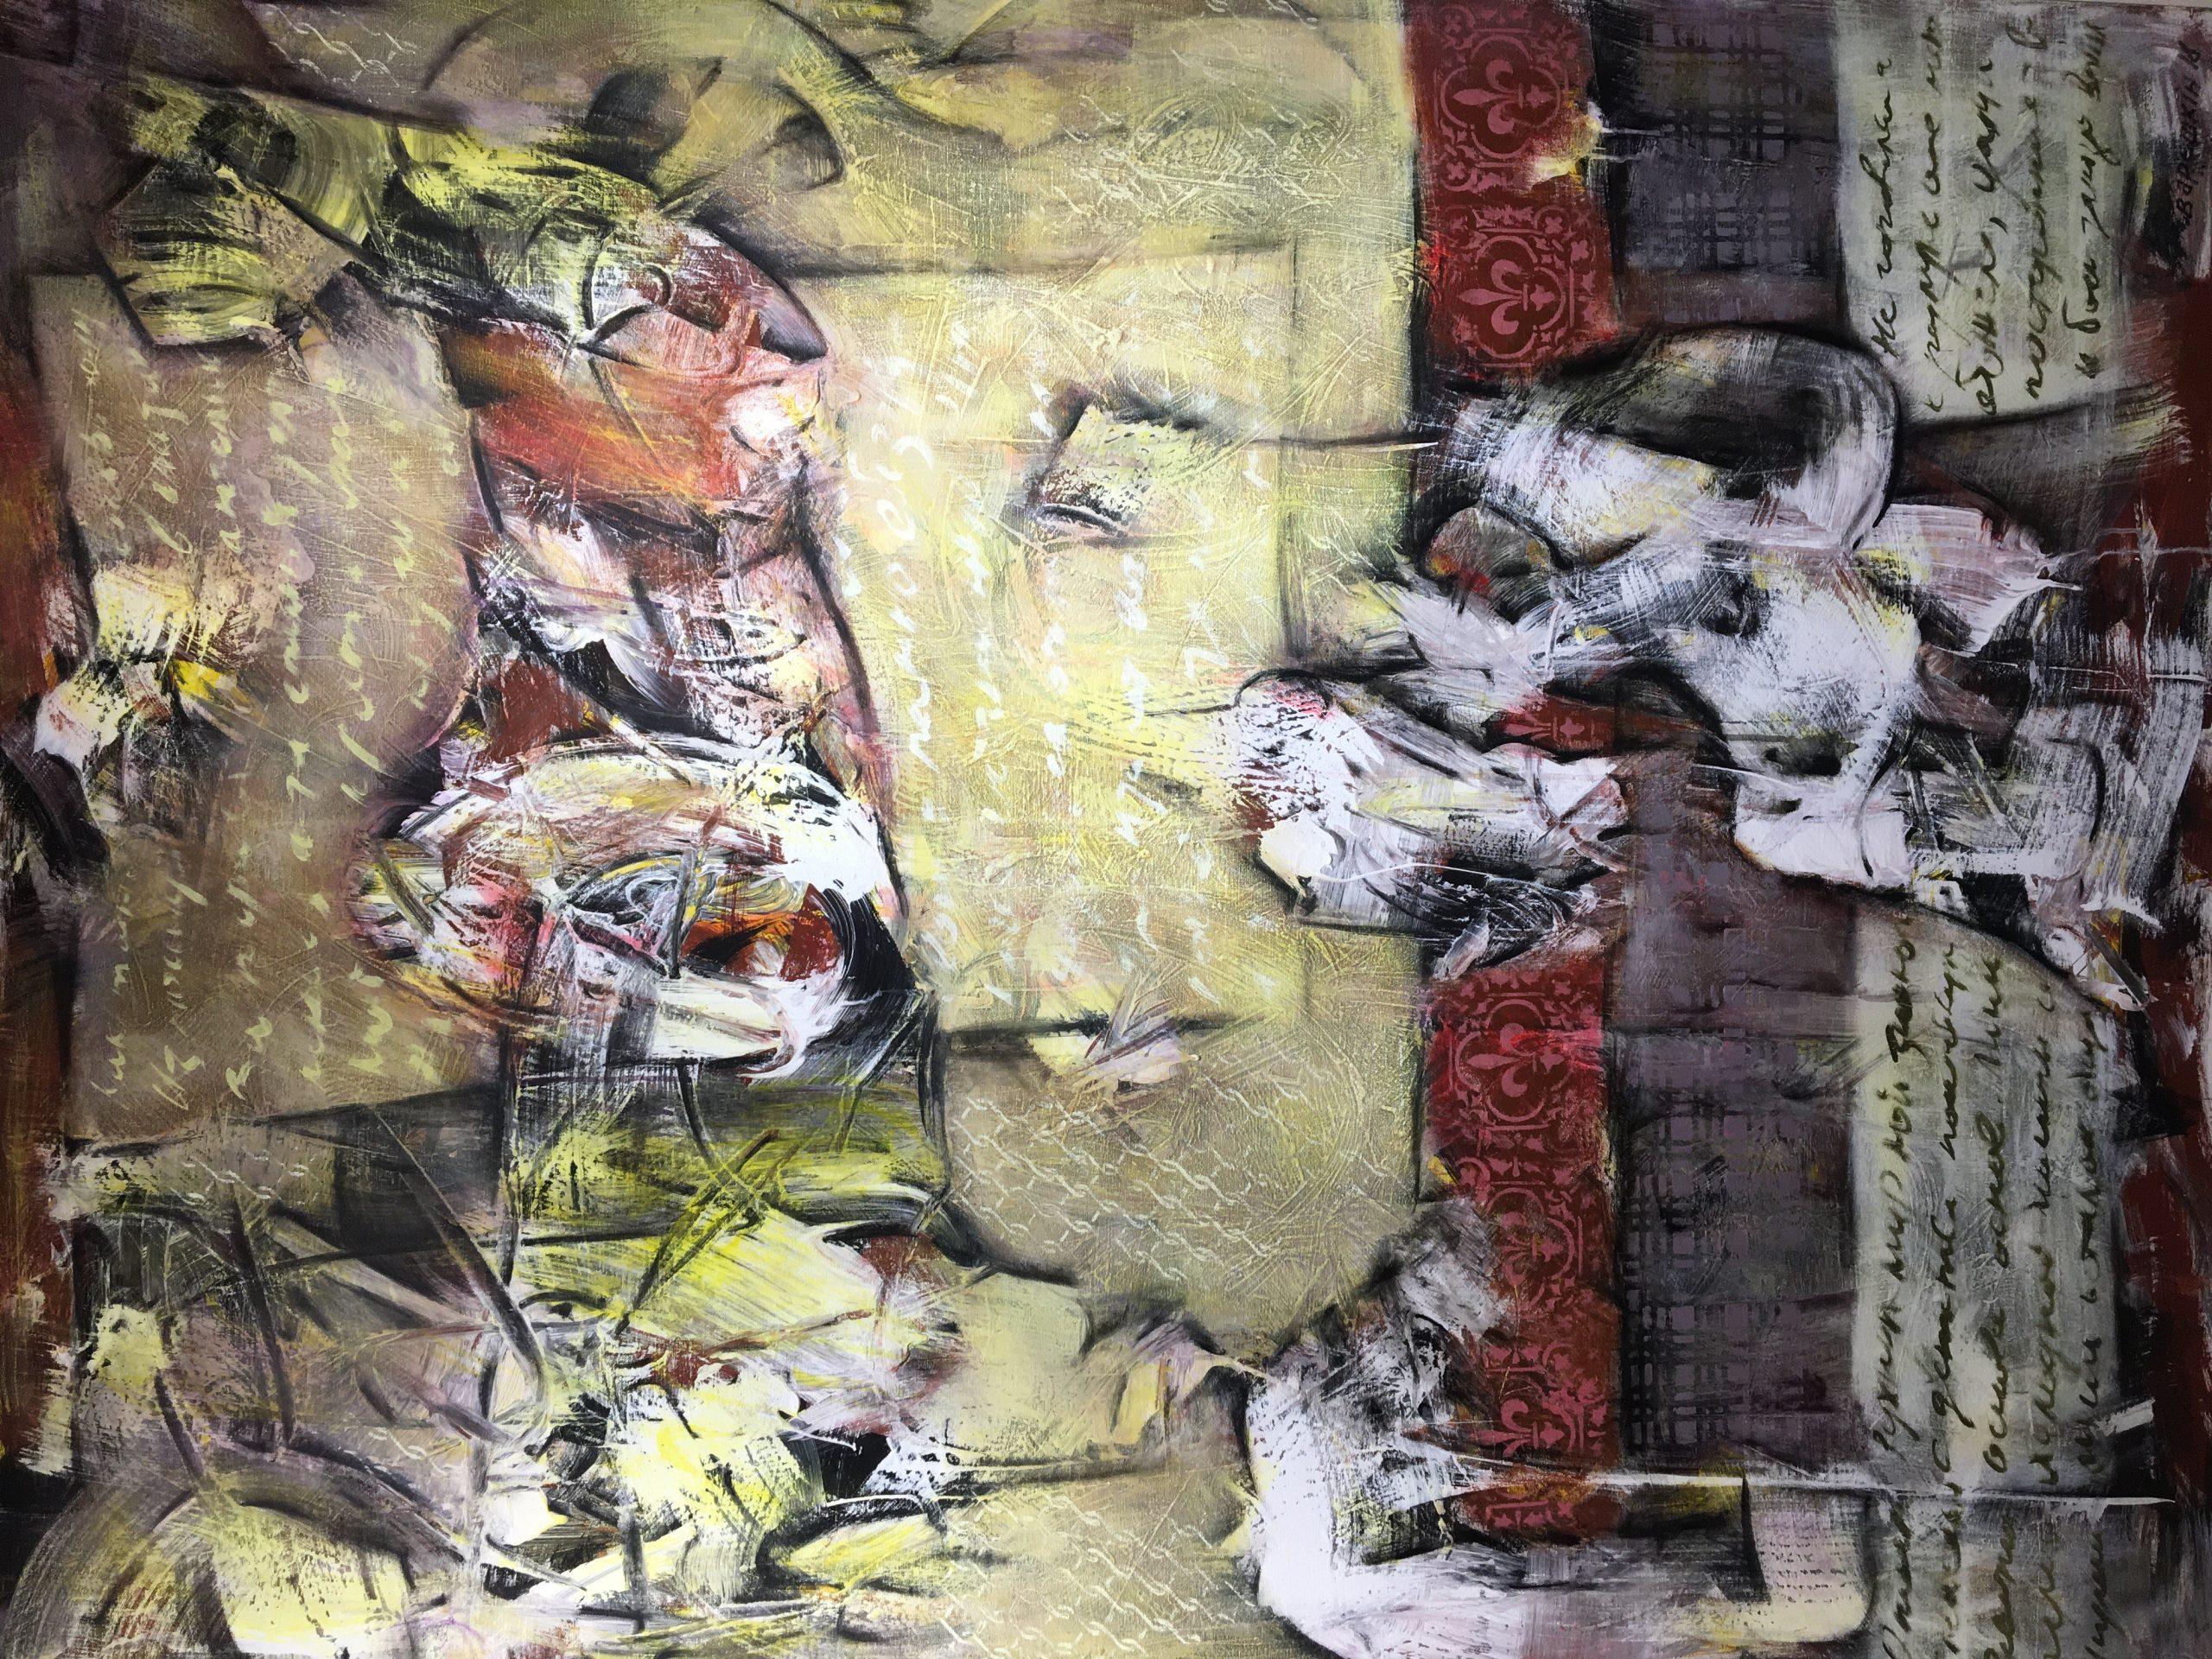 FABRICANTE FABRICARUM: Игорь Варешкин и арт-проект «В лабиринтах времени»